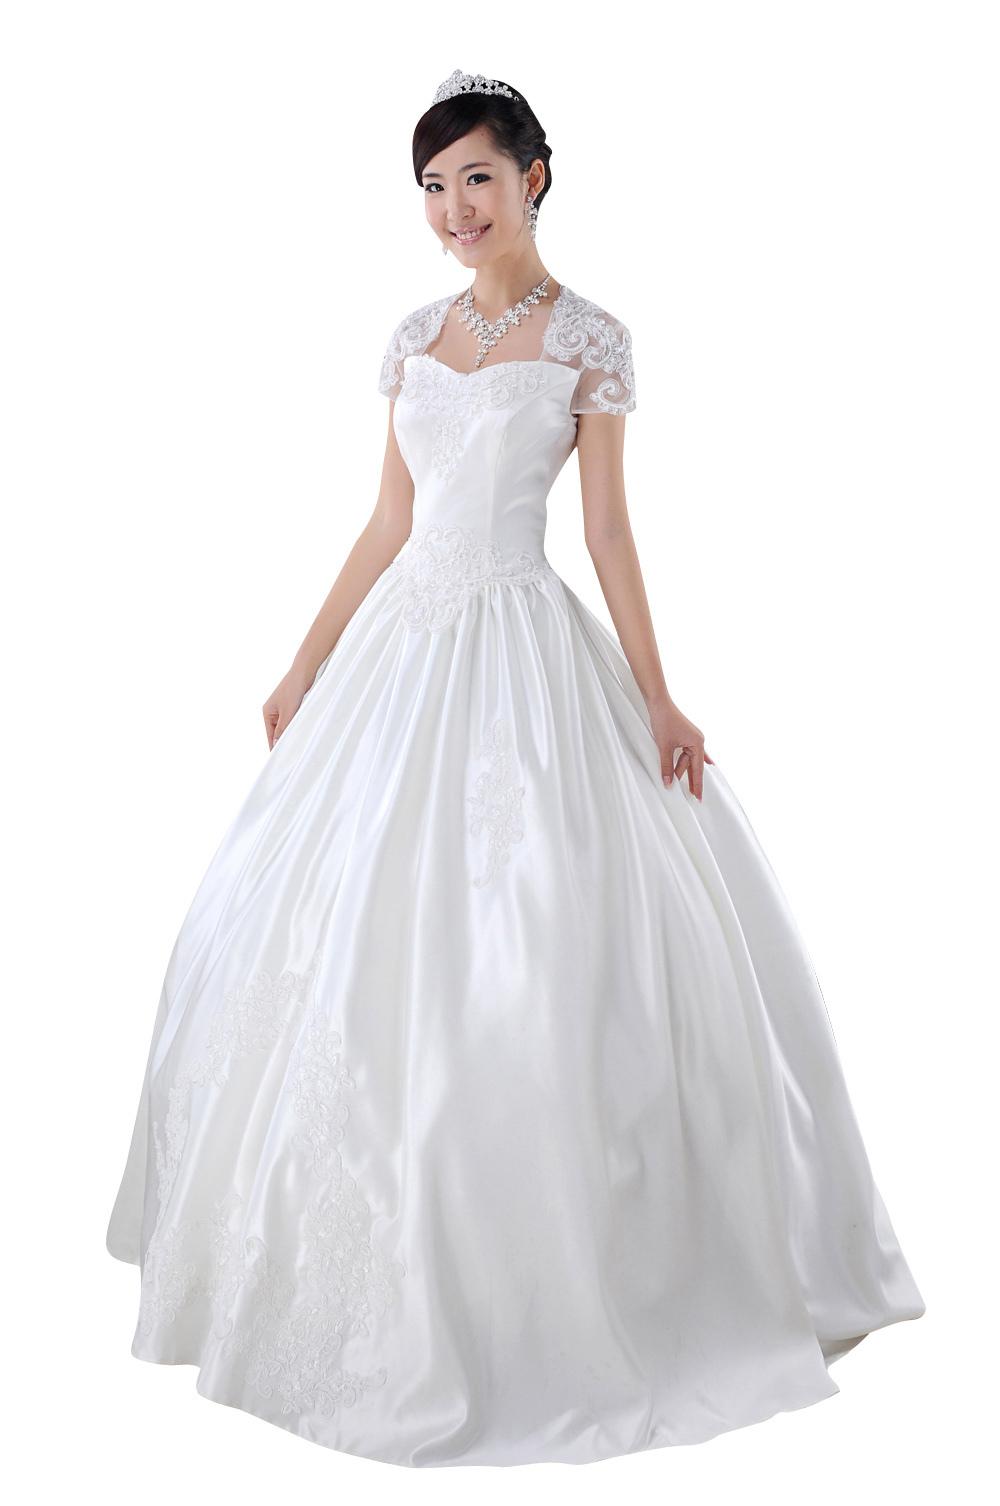 4941a korean lace wedding dress bra wedding upscale 261 jpg